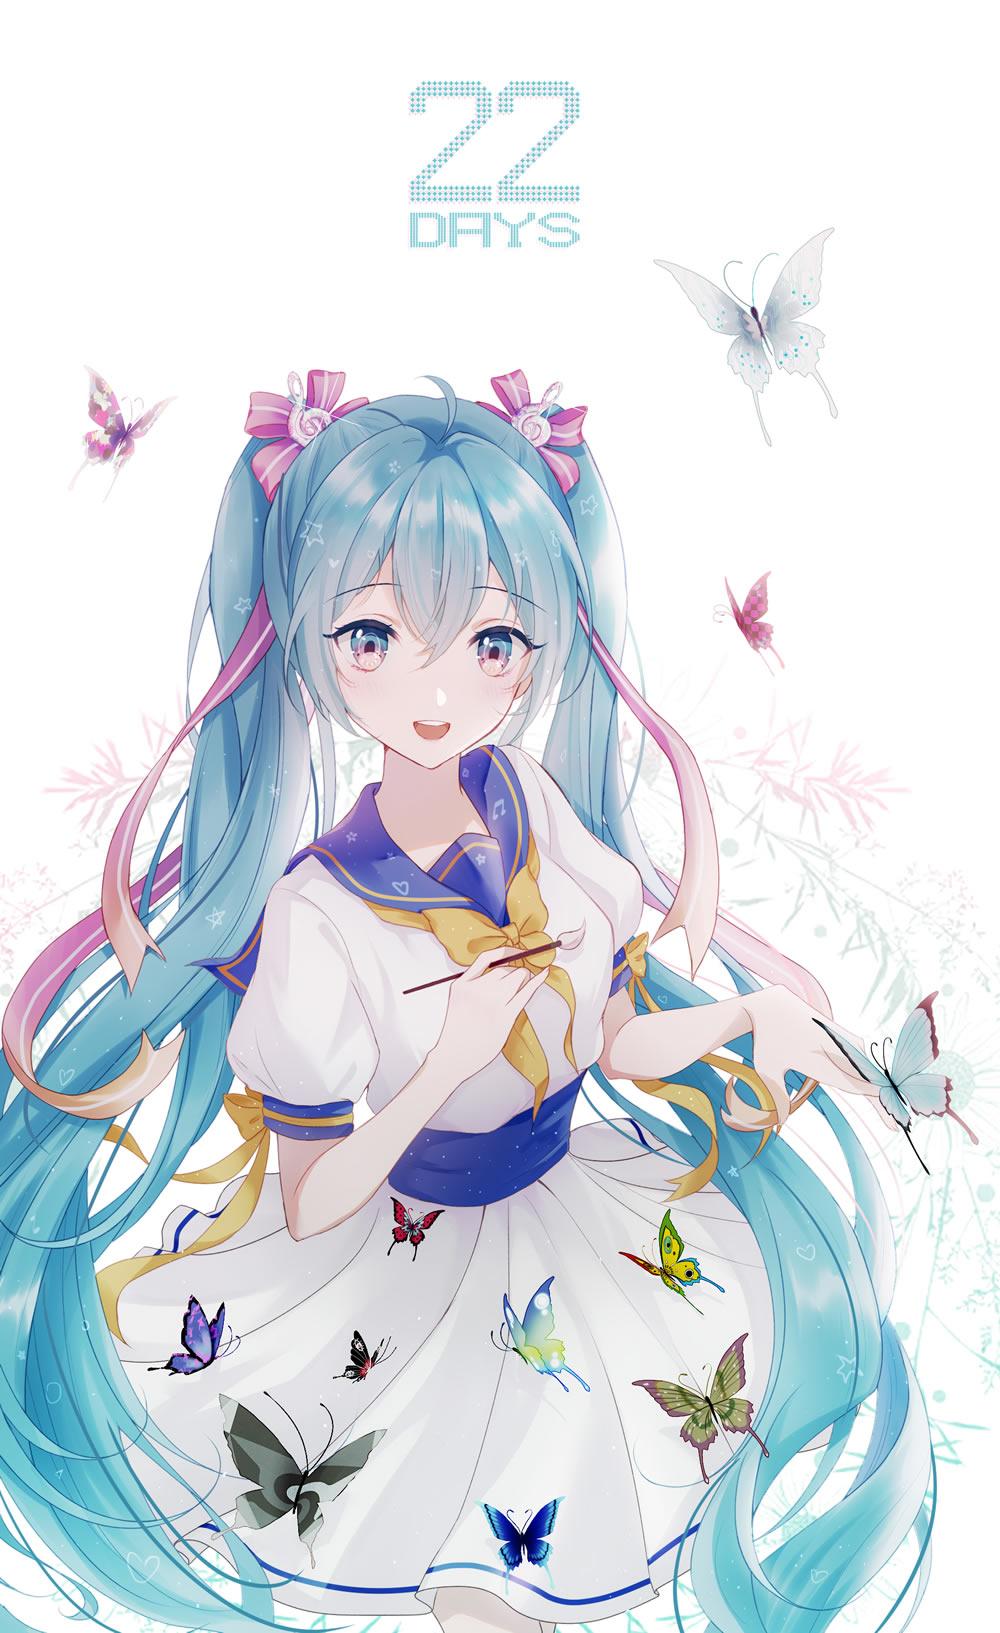 Mikufan com – A Hatsune Miku Fansite